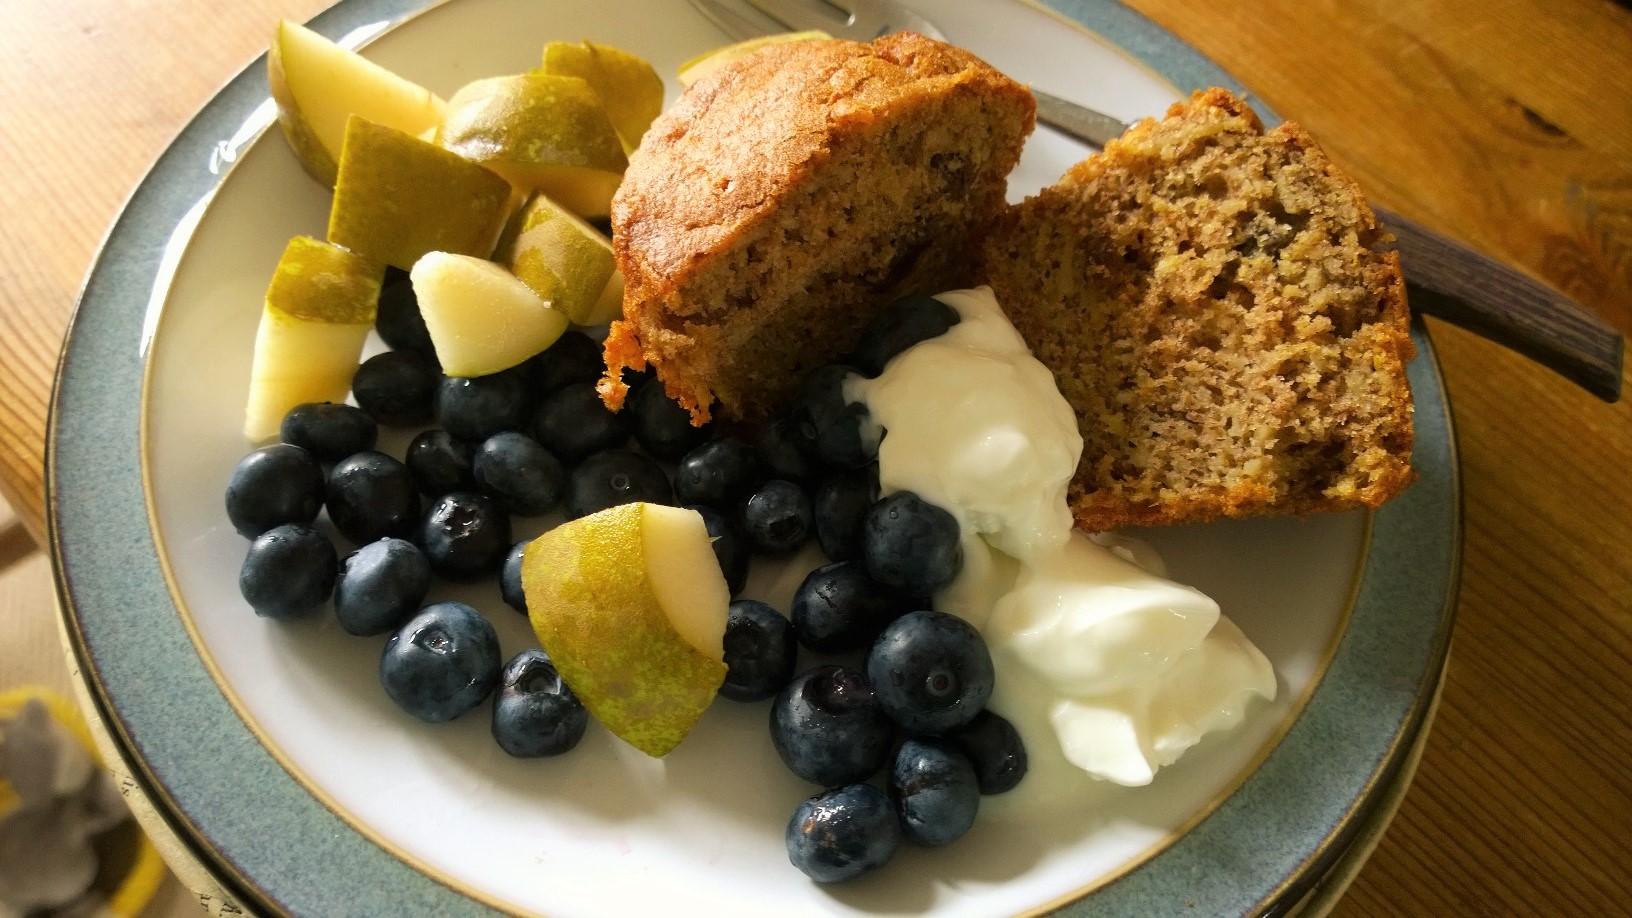 Parsnip and orange muffin